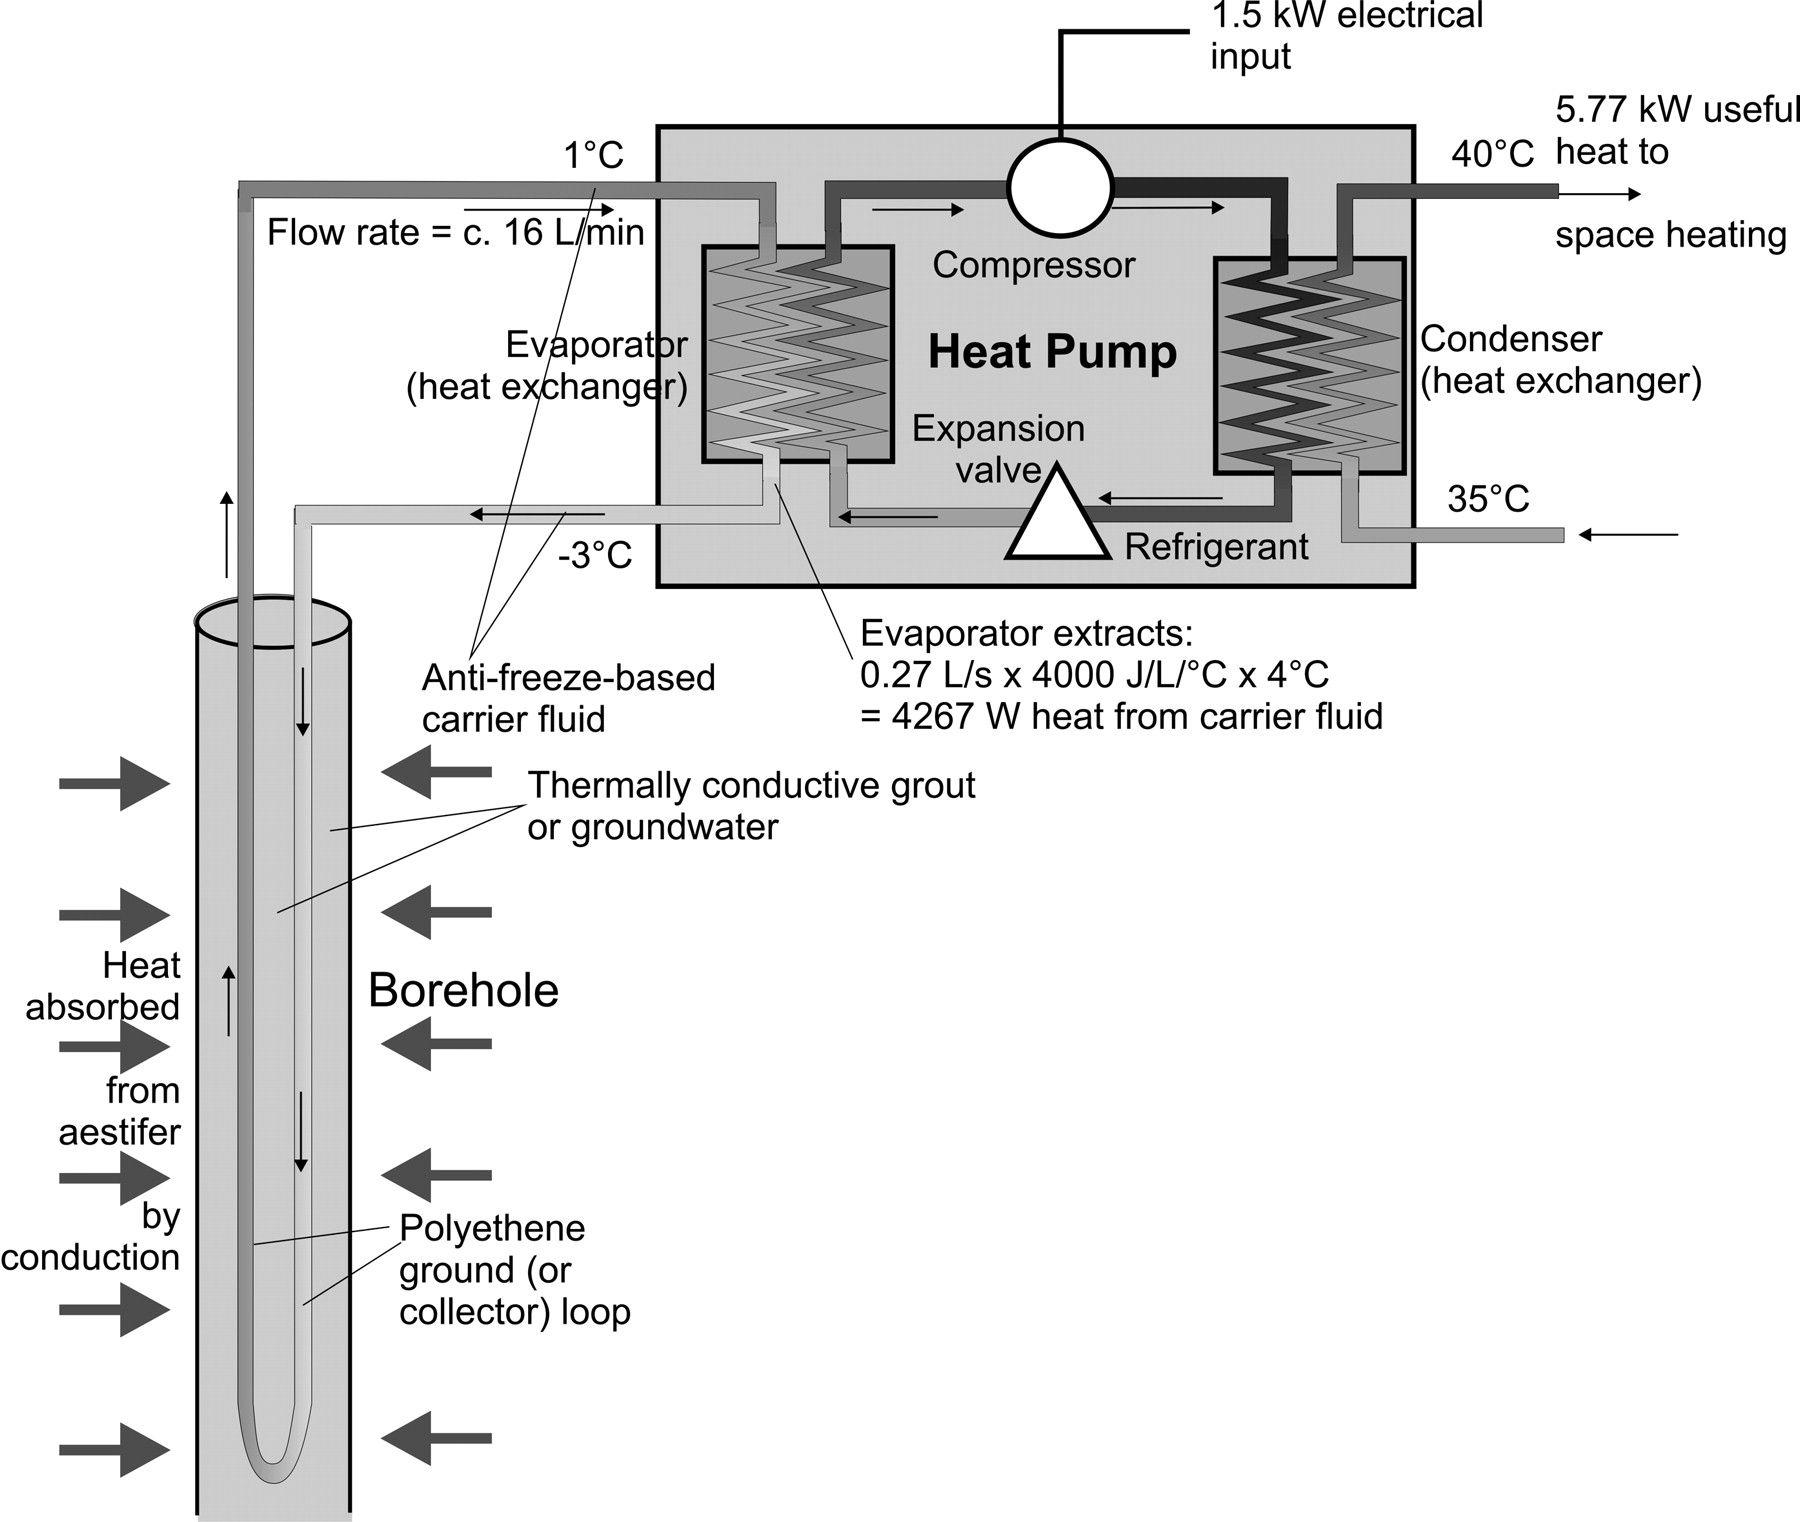 Pin by m j on geothermal & heat pumps Heat pump